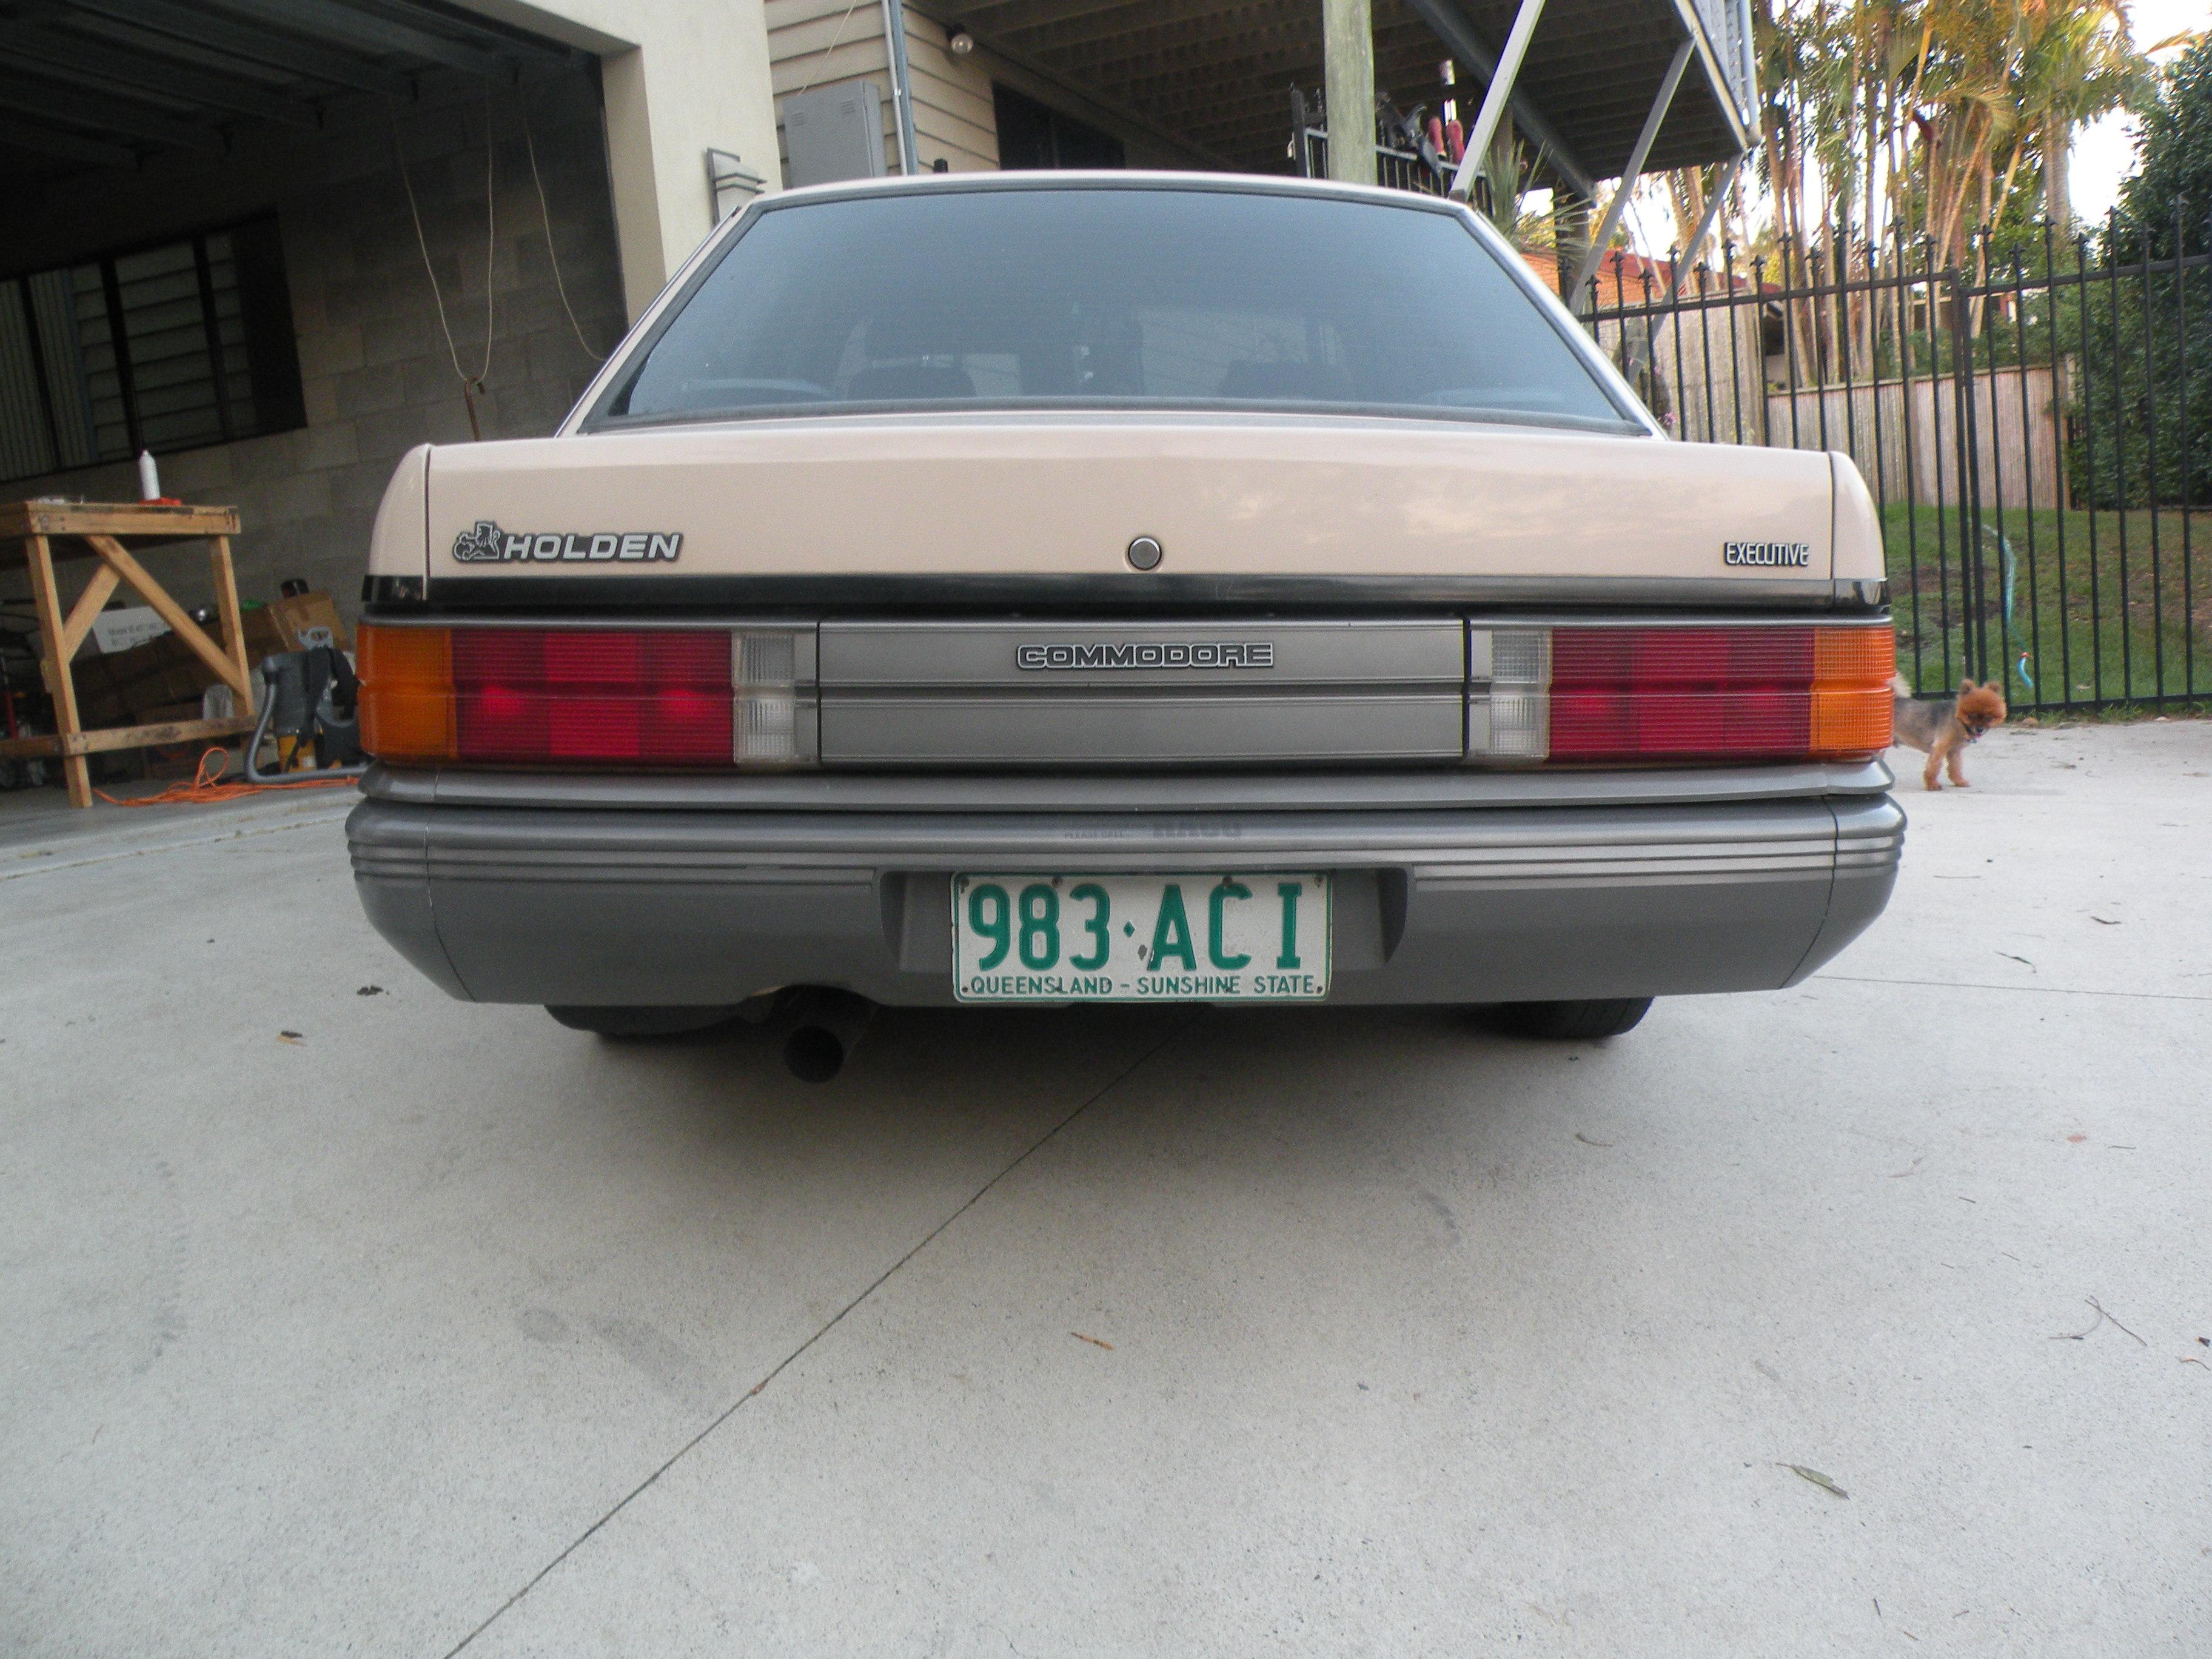 VL CALAIS phatridez Cars Holden commodore Vehicles t